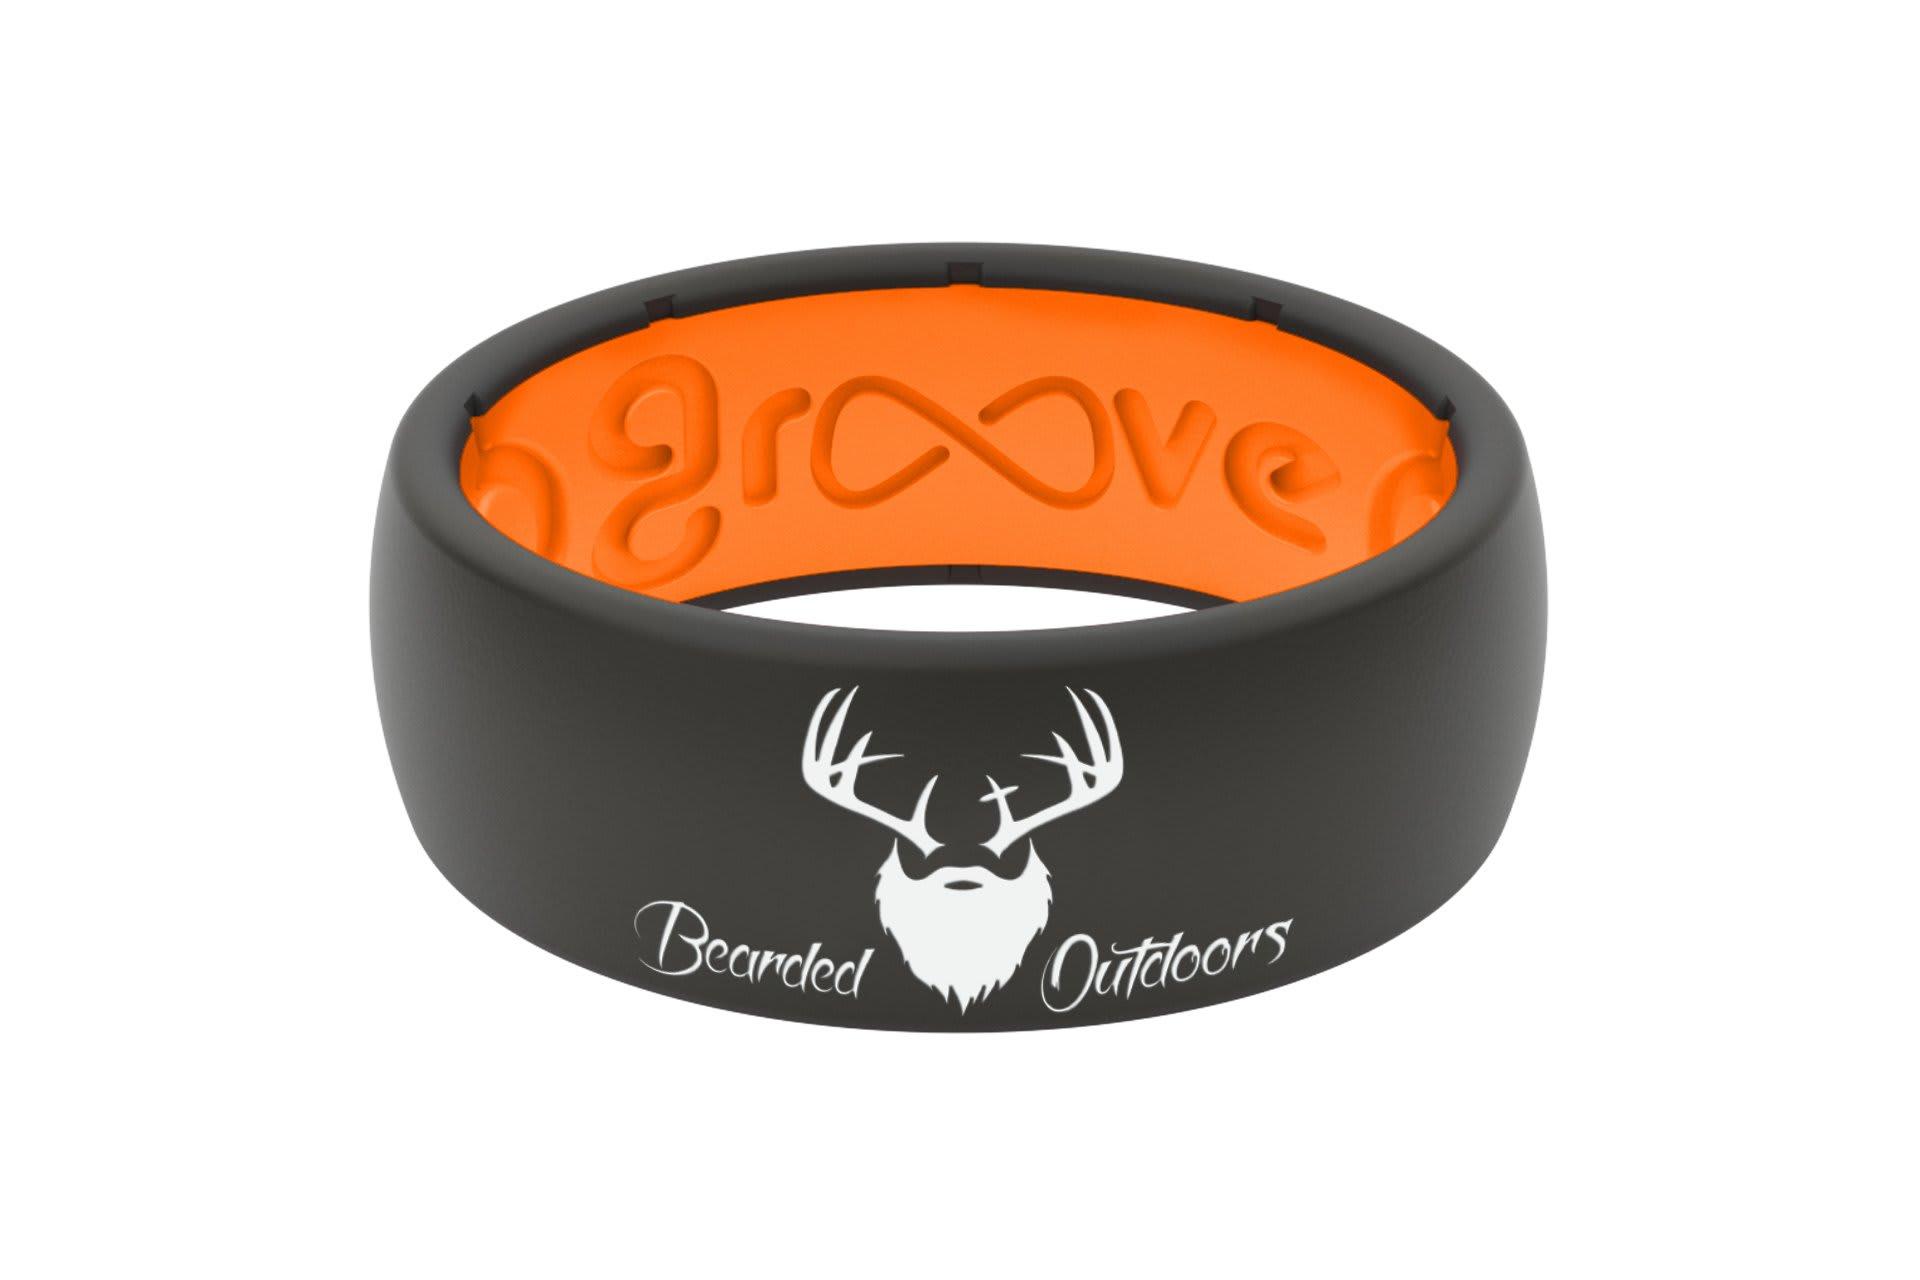 Original Bearded Outdoors Black/Orange - Groove Life Silicone Wedding Rings